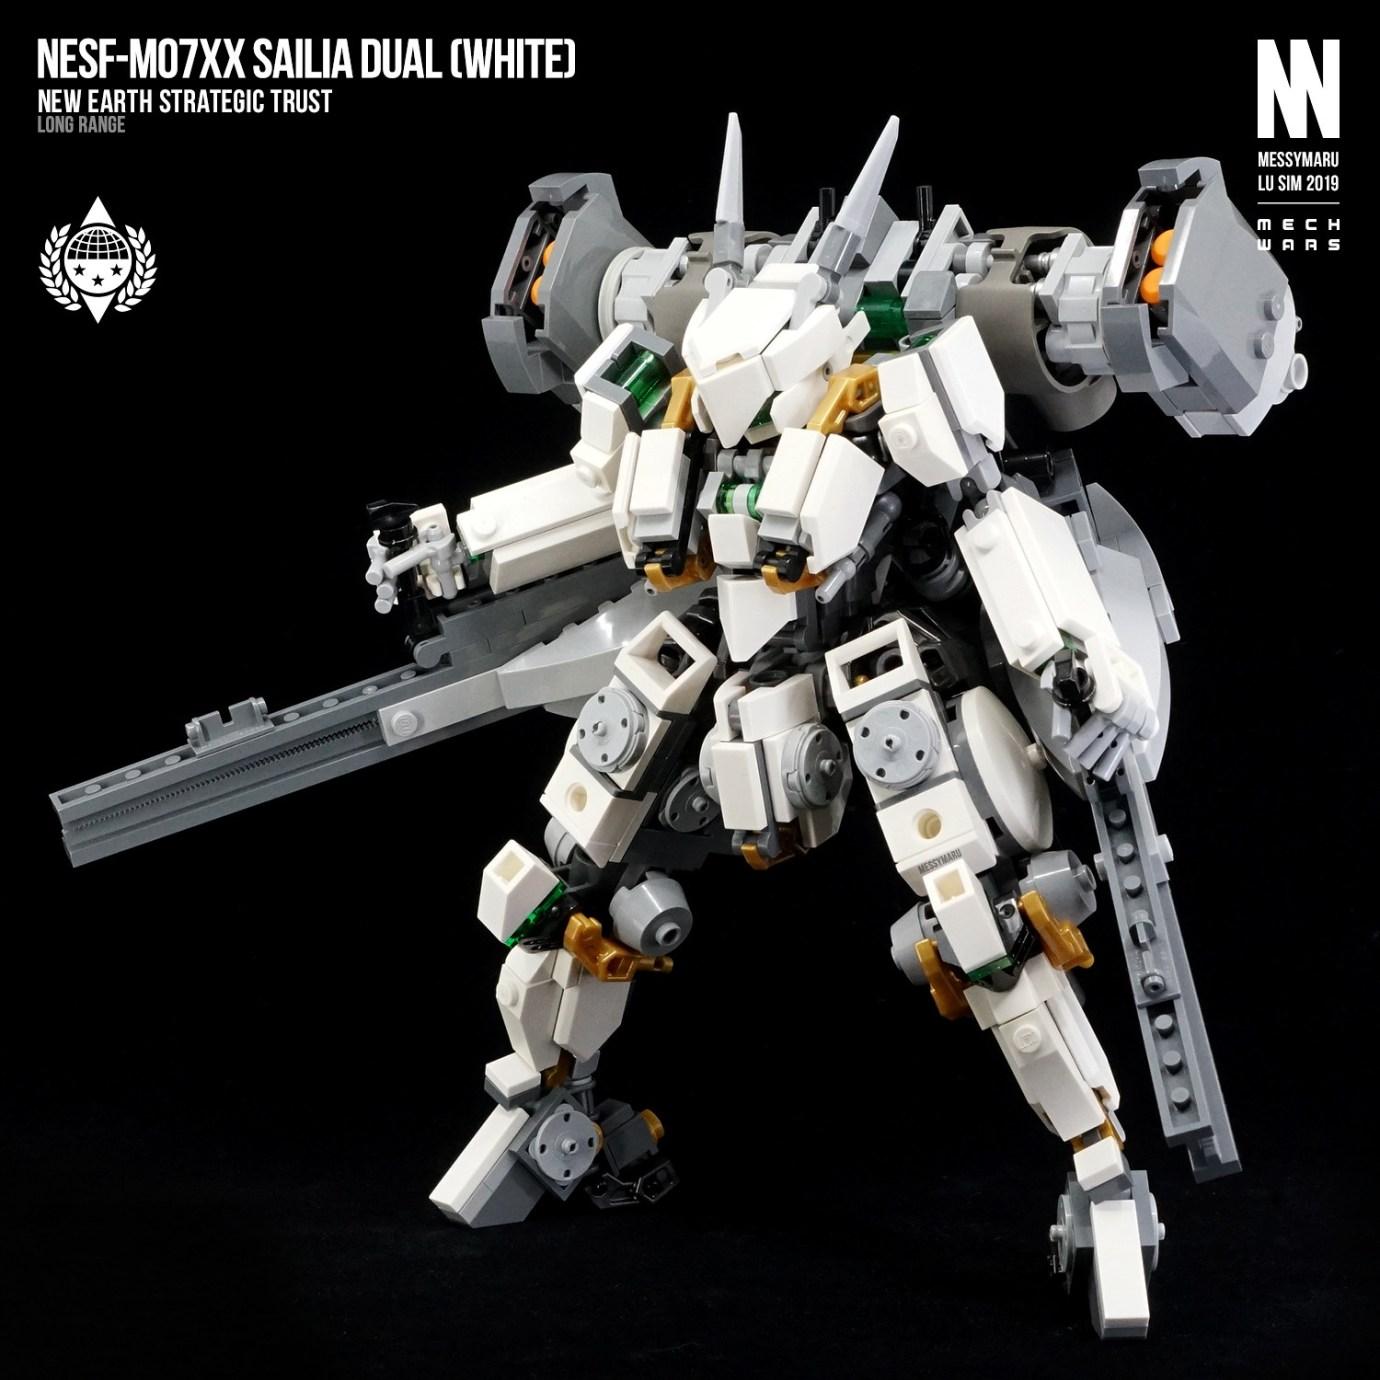 NESF-M07XX Sailia Dual (White Ver.)